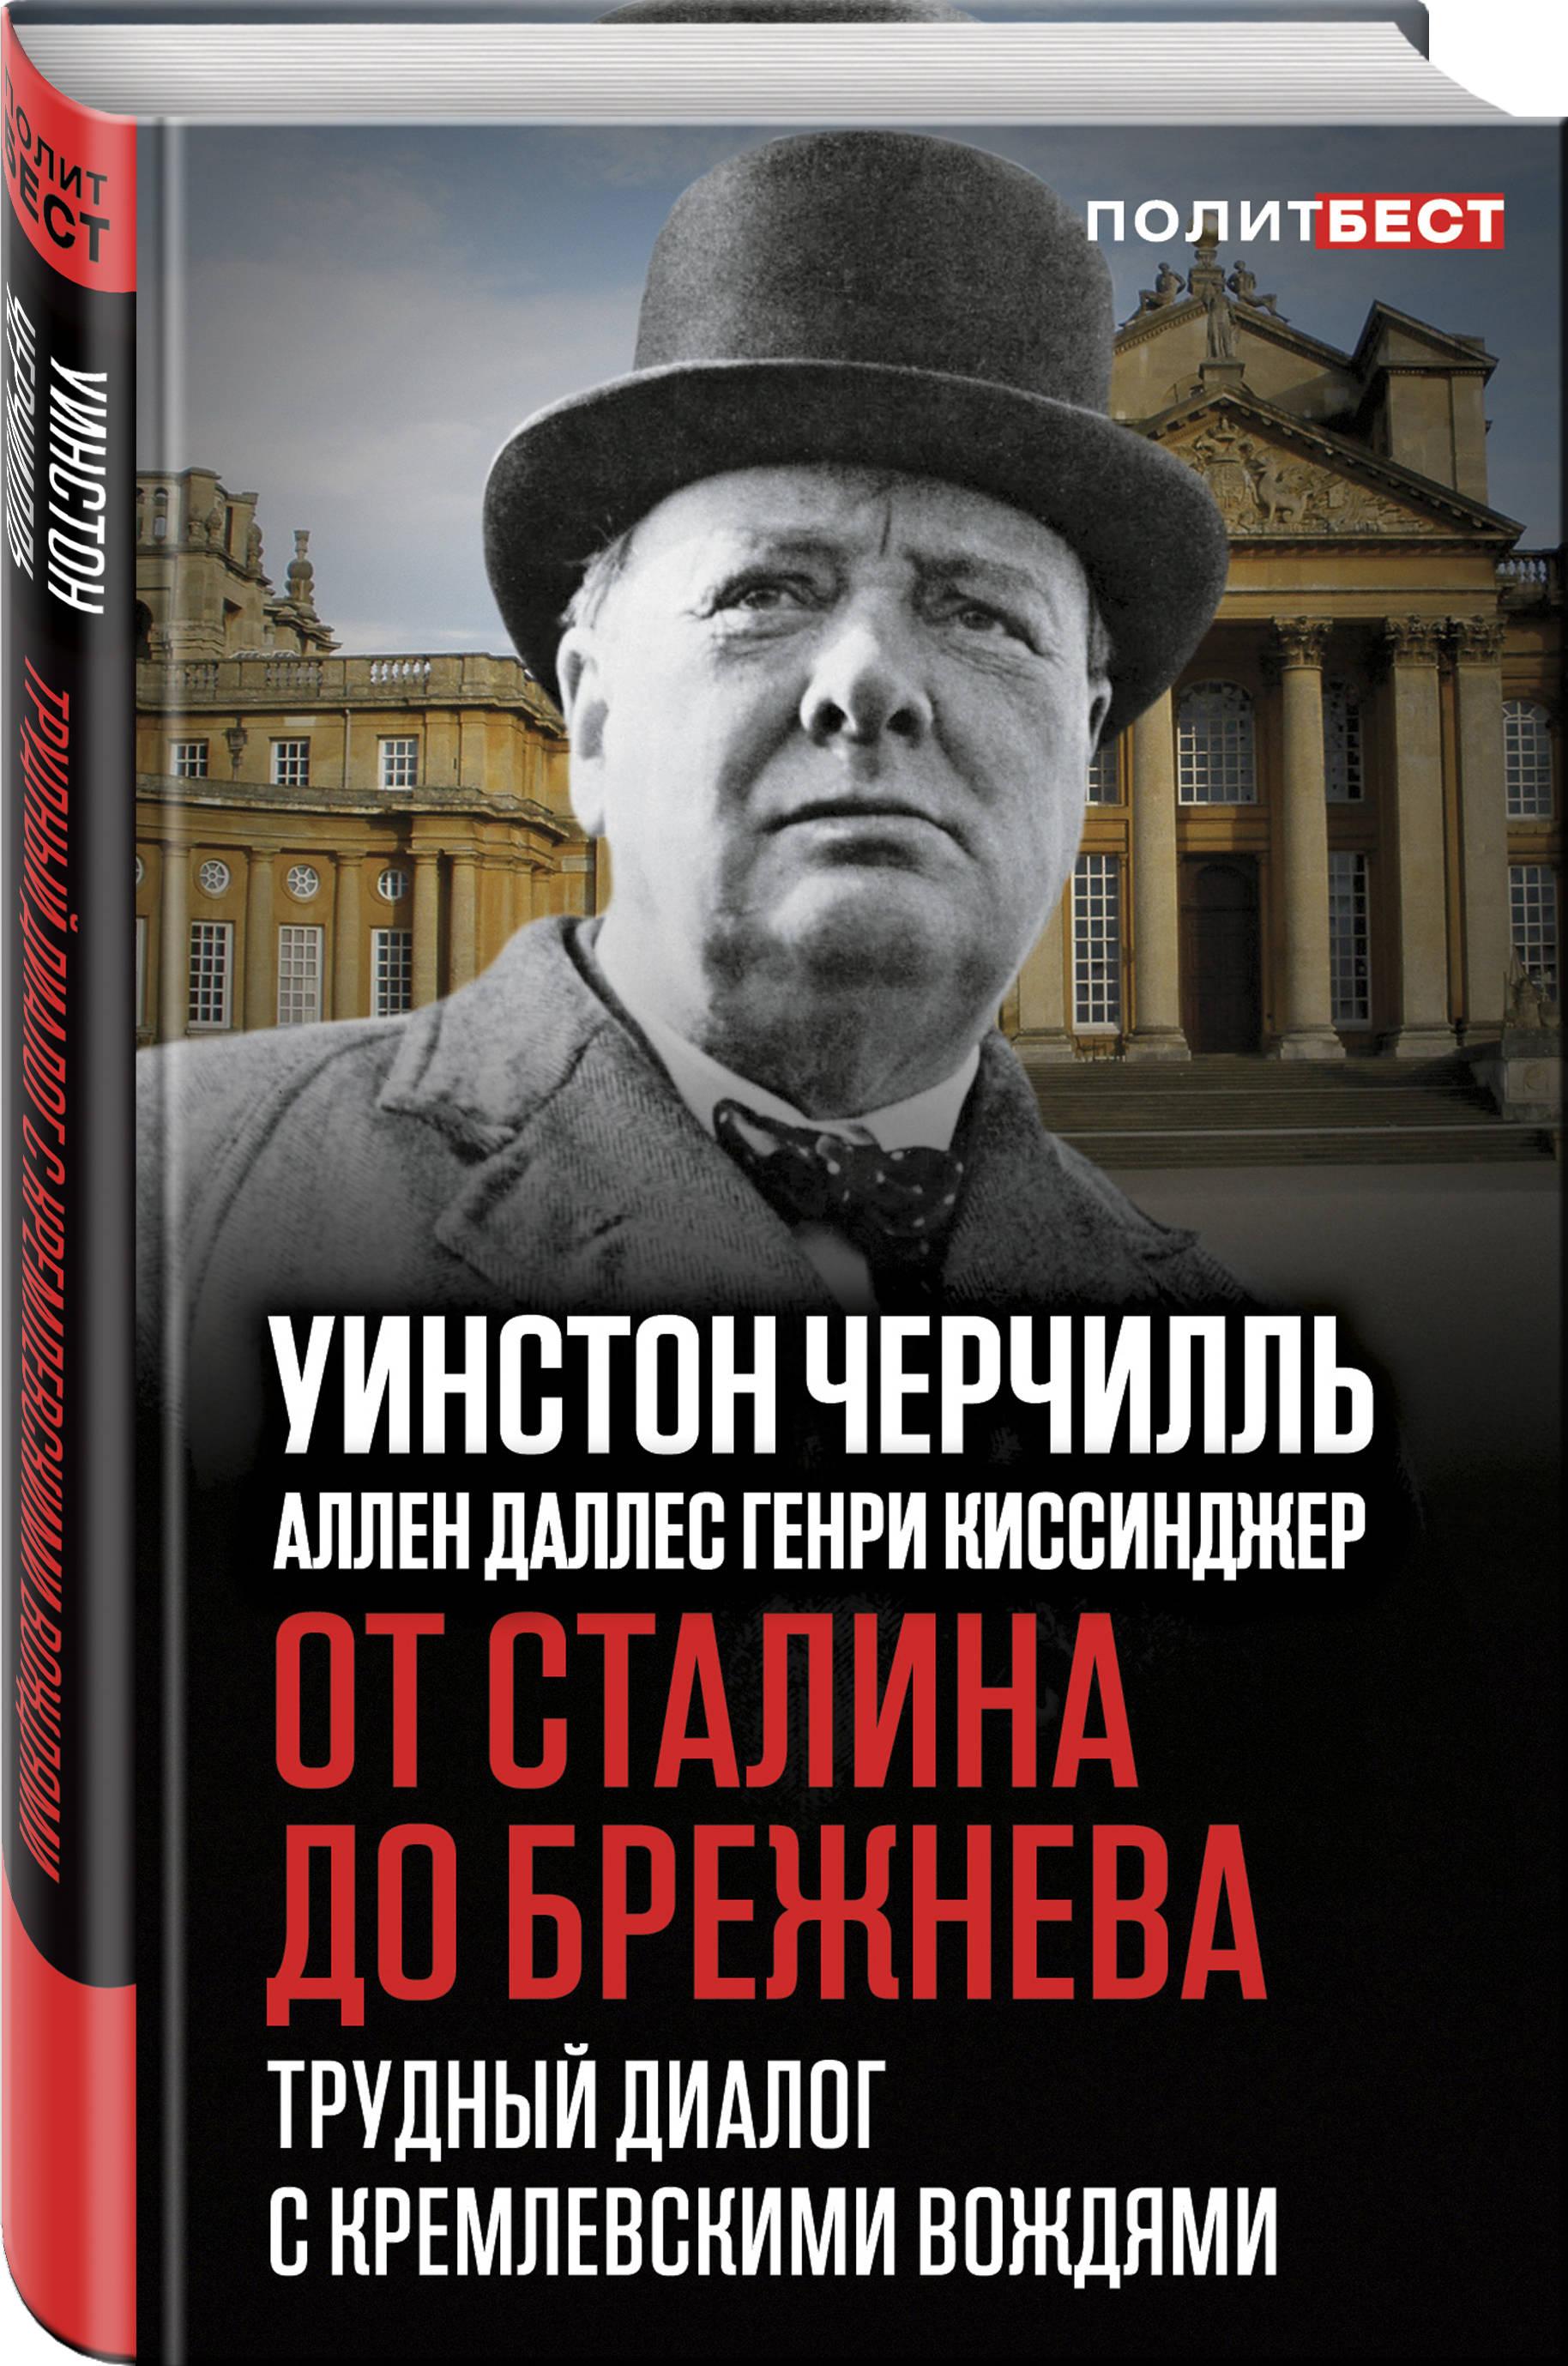 Уинстон Черчилль, Аллен Даллес, Генри Киссинджер От Сталина до Брежнева. Трудный диалог с кремлевскими вождями вел тэйк